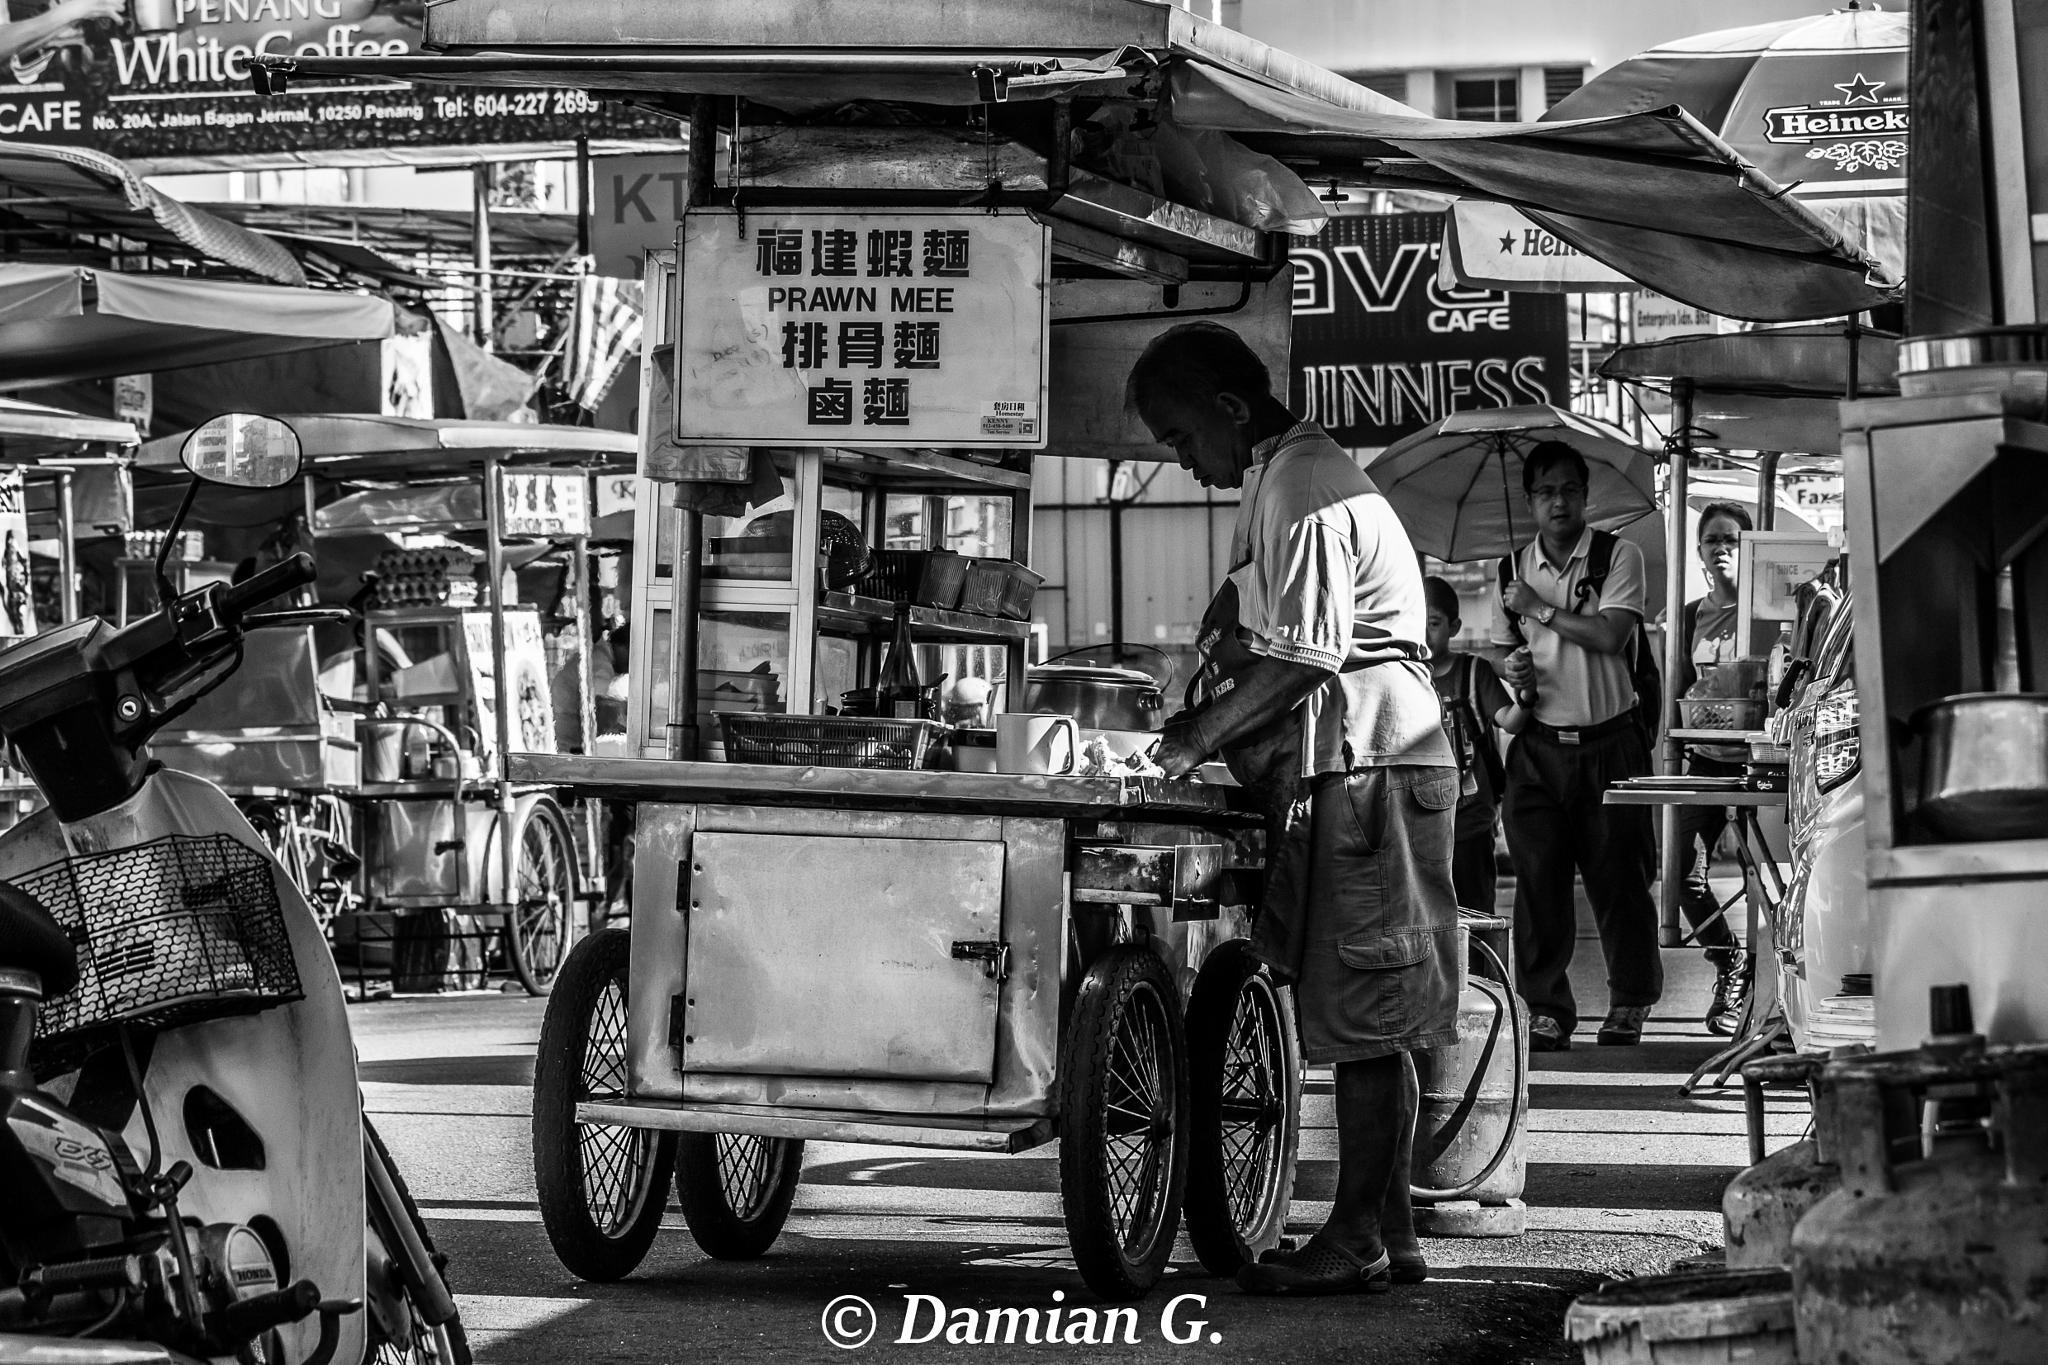 Street Vendor, Penang by damianstm06